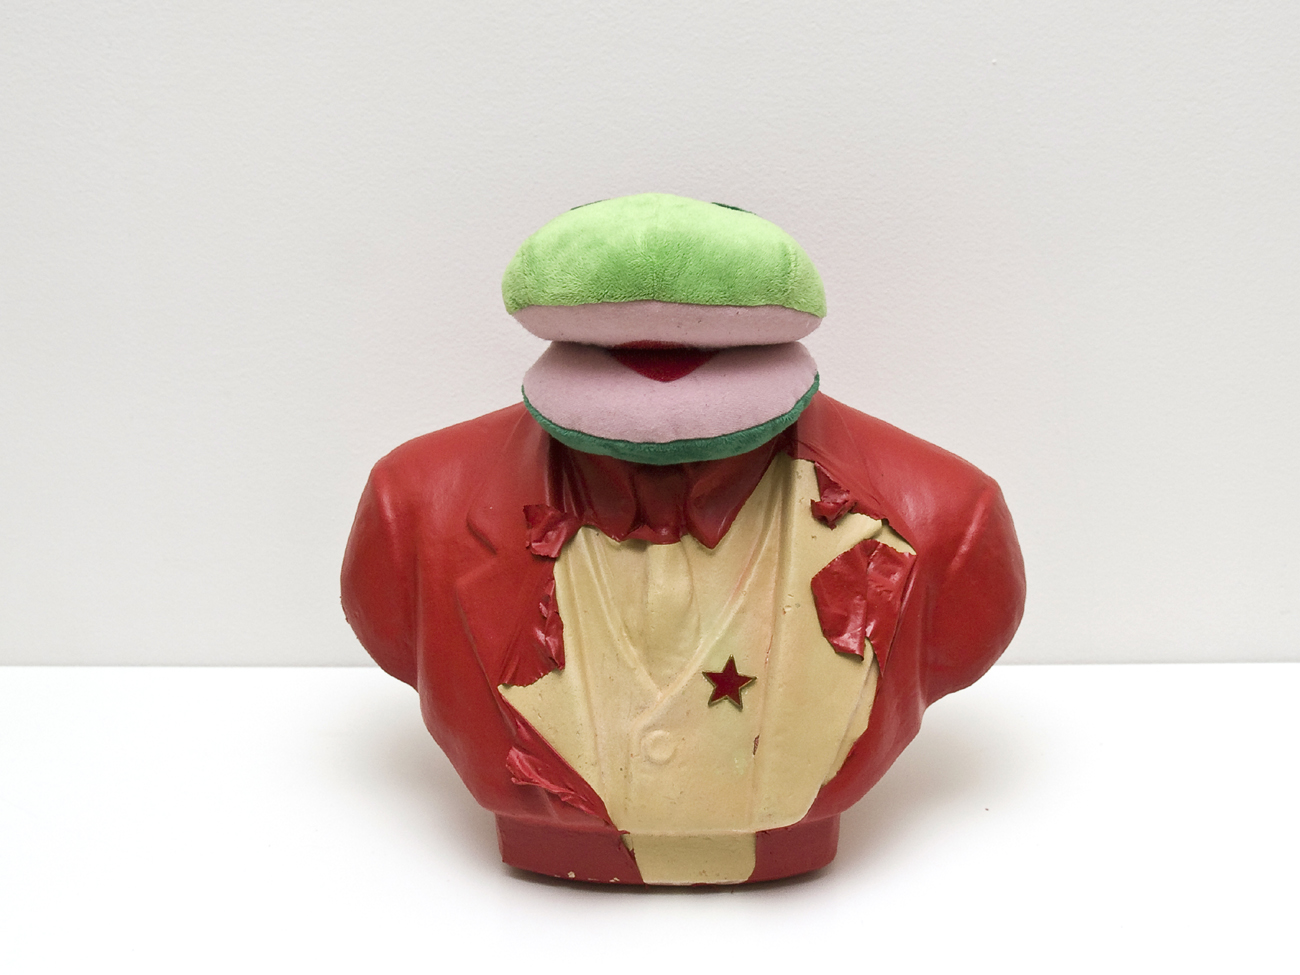 Kermit the Frog, 2015